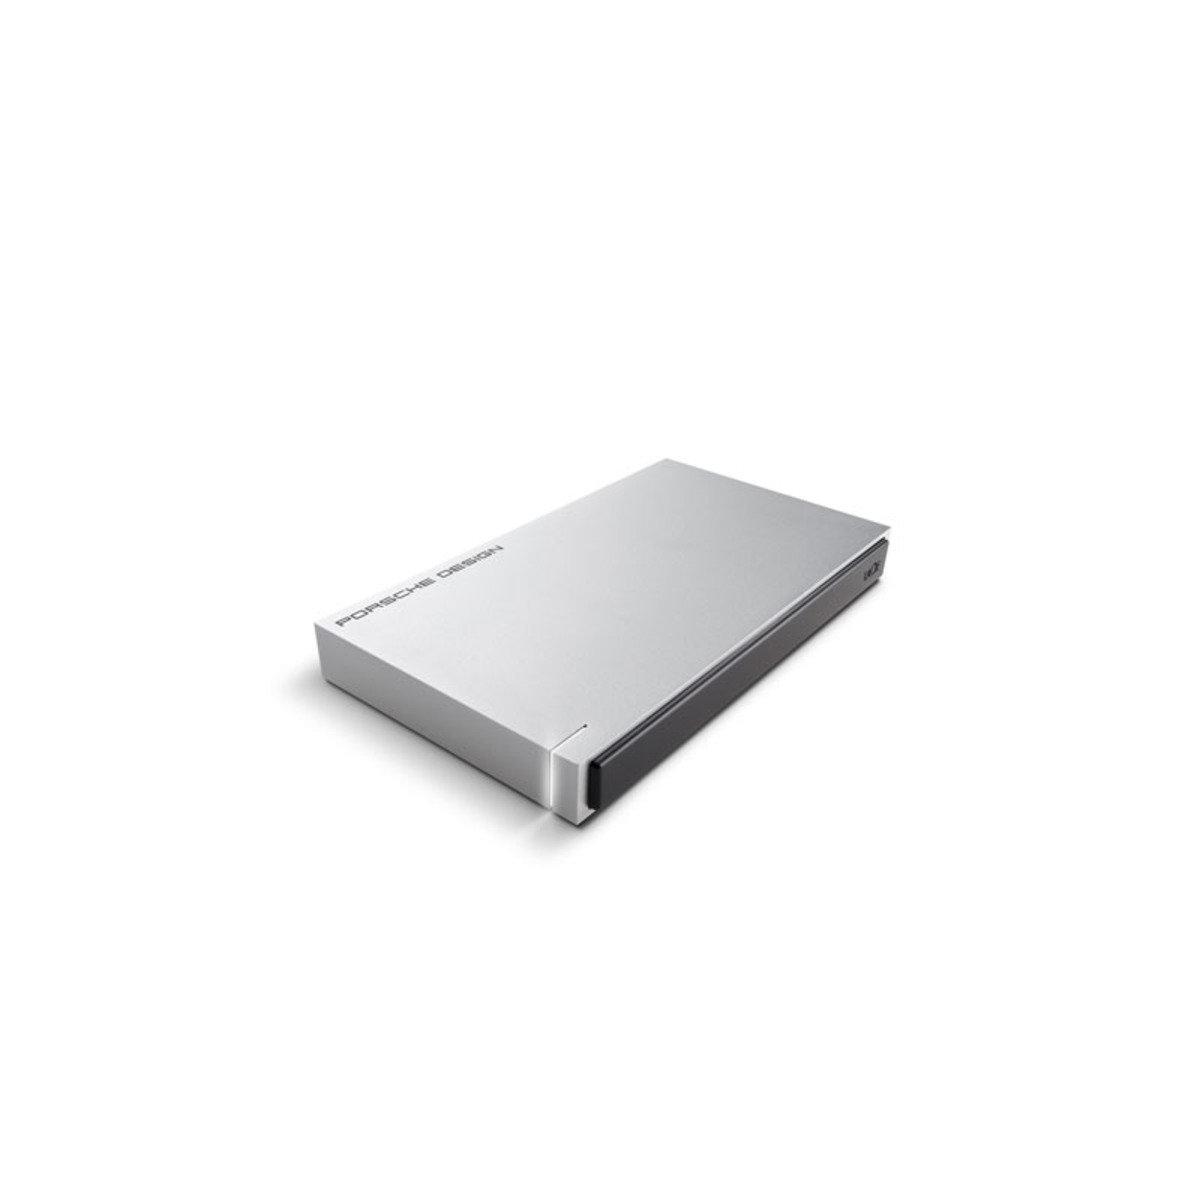 Porsche Design Mobile For Mac 2TB USB3.0 2.5吋 外置硬碟 9000461